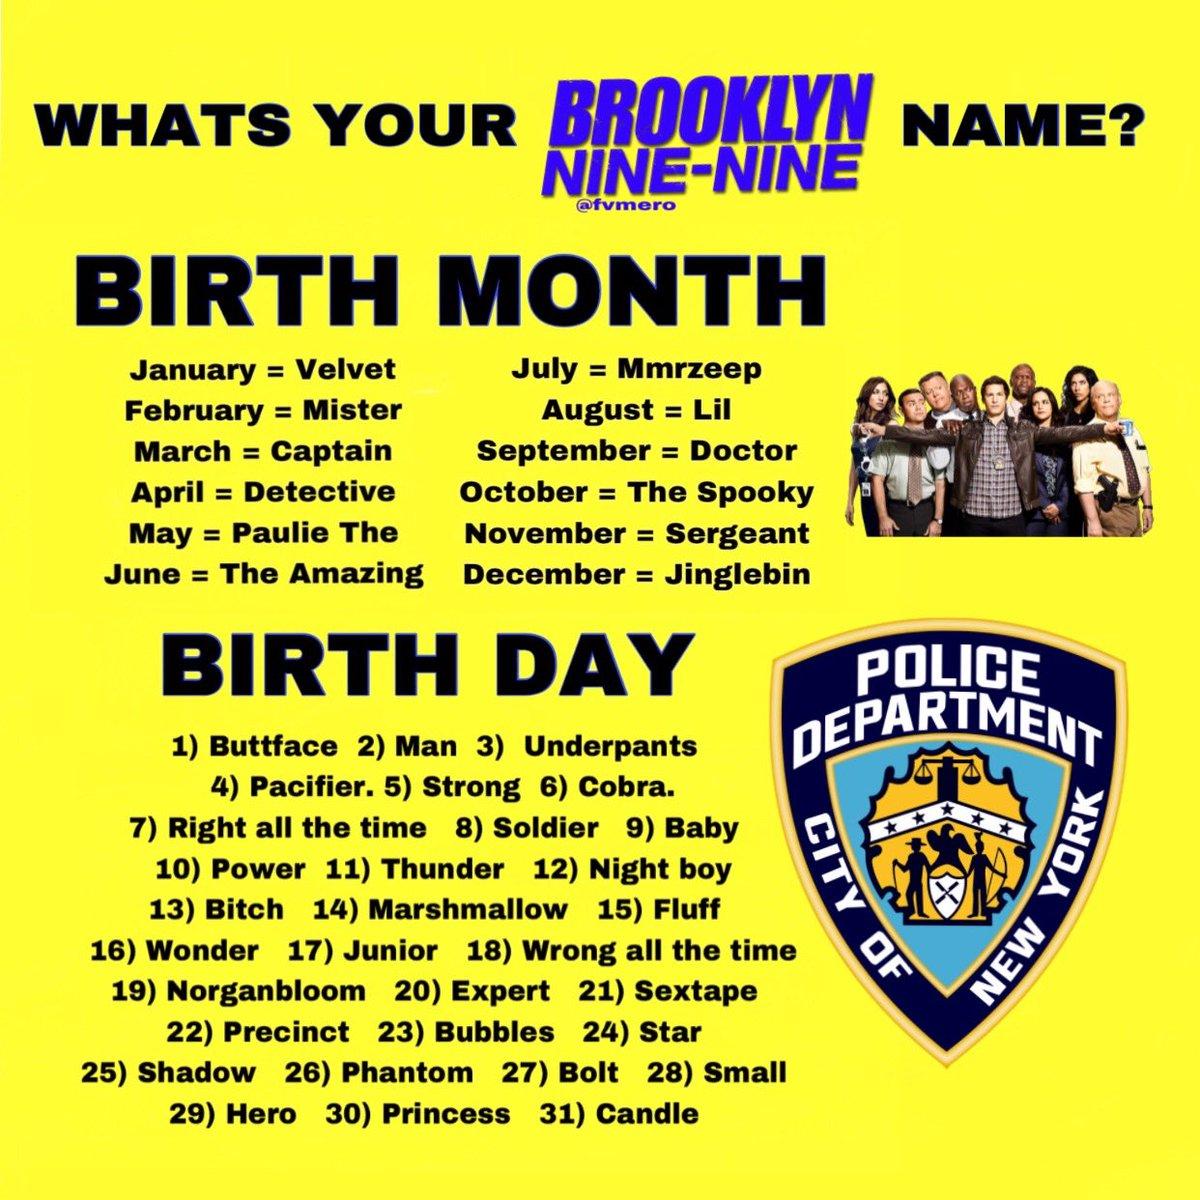 what's your Brooklyn Nine-Nine name?